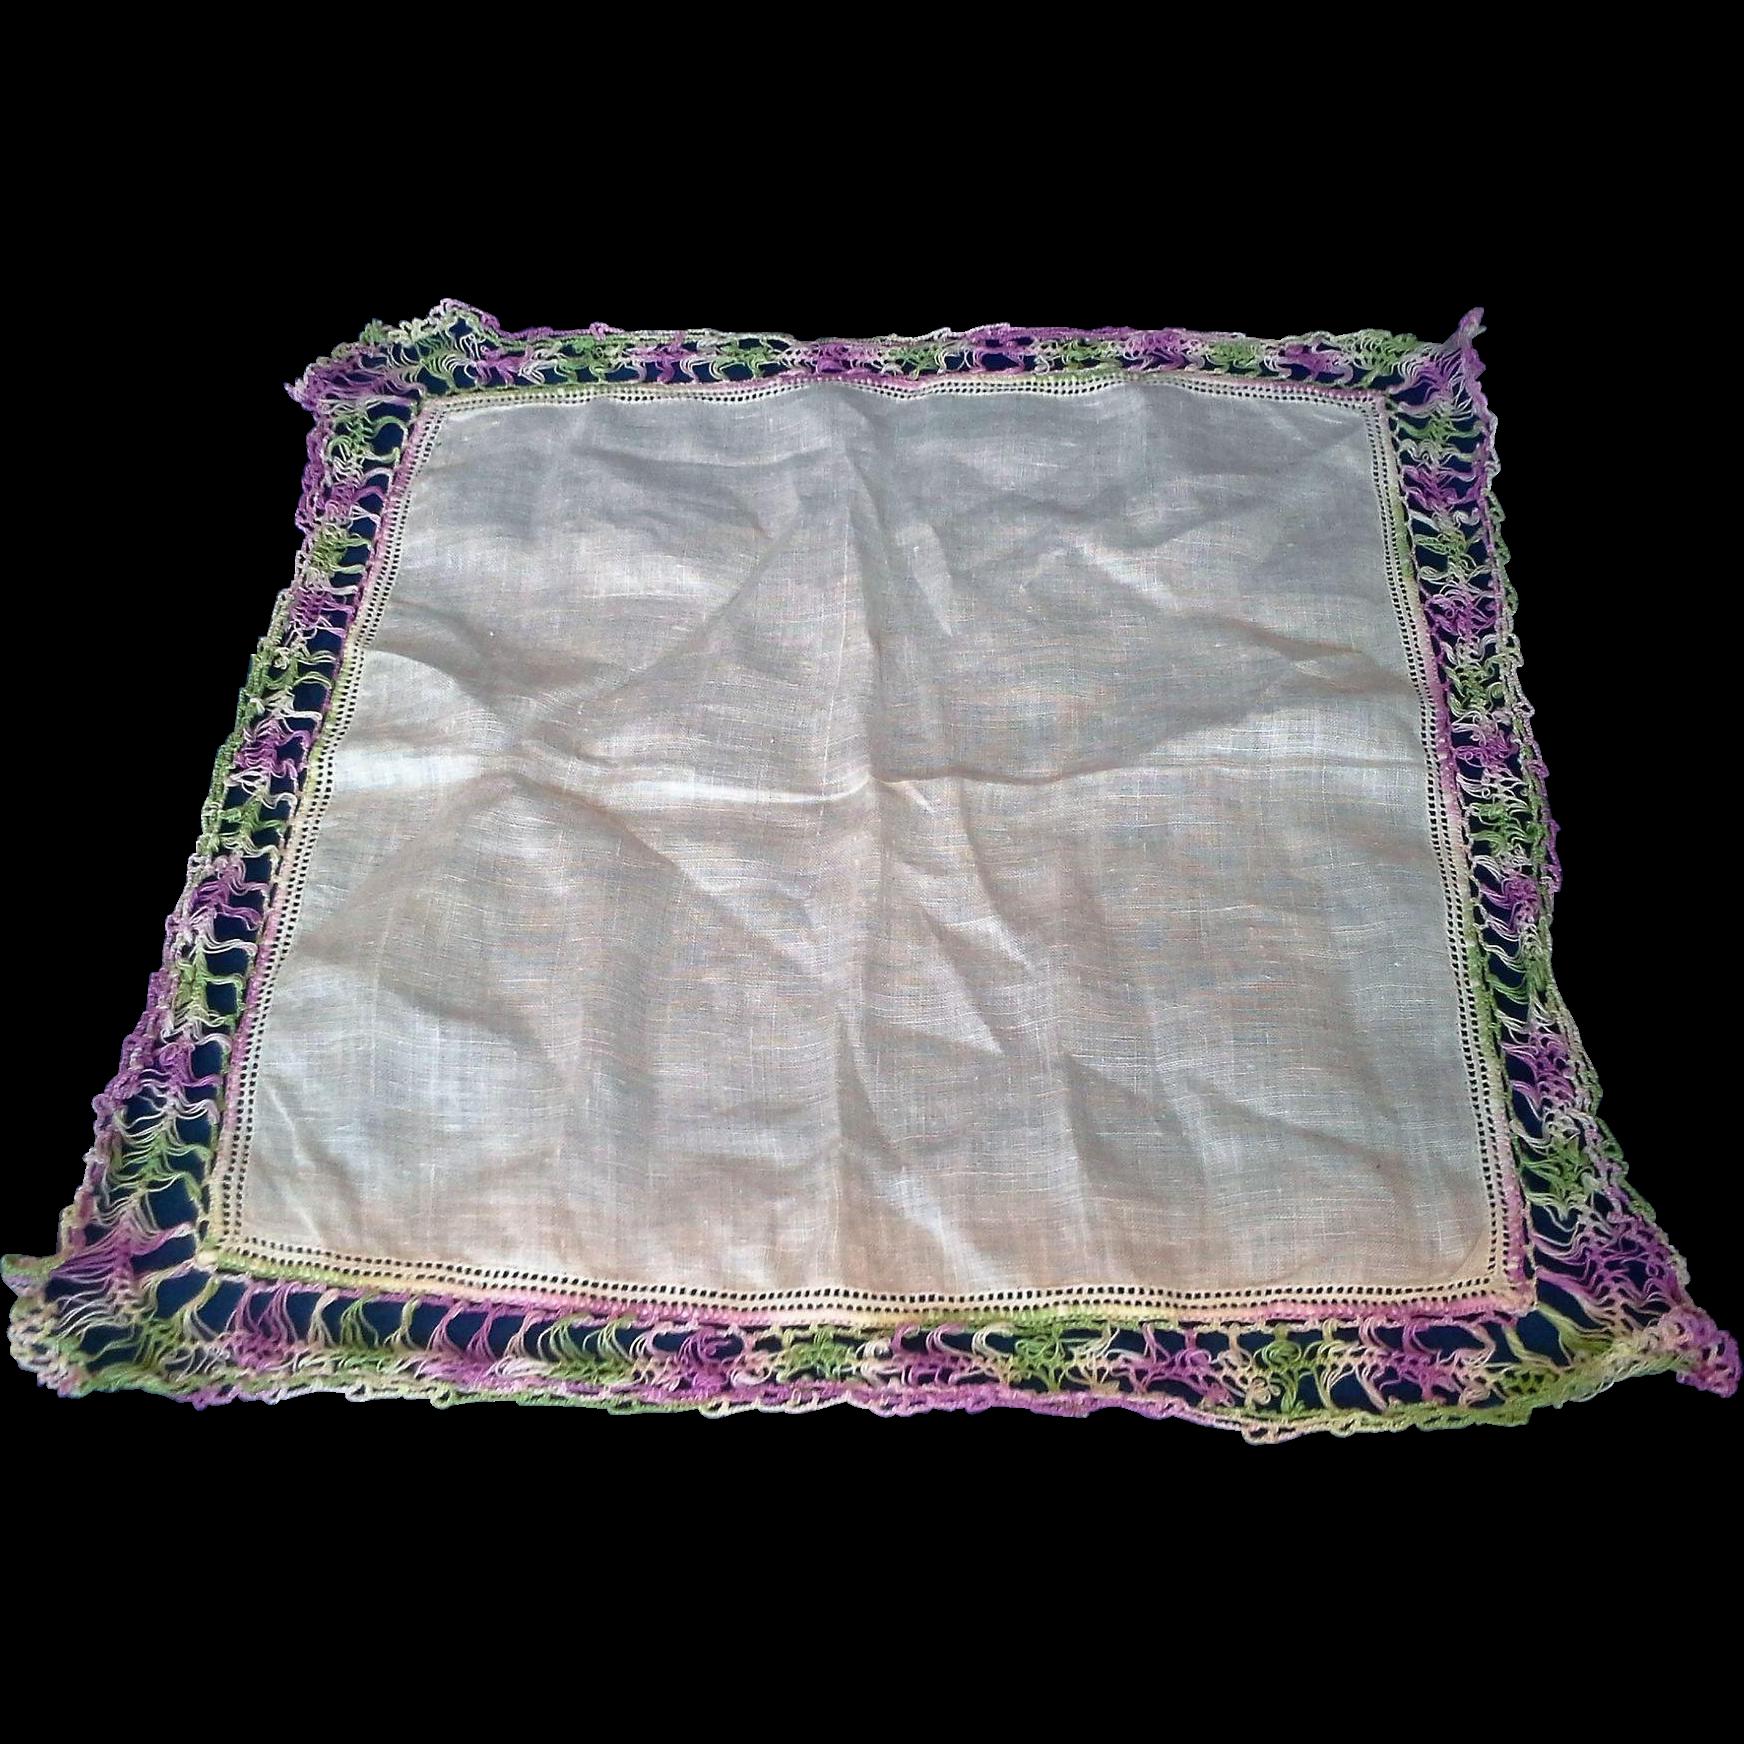 White Linen Crocheted Lace Purple Green Border Hanky Handkerchief